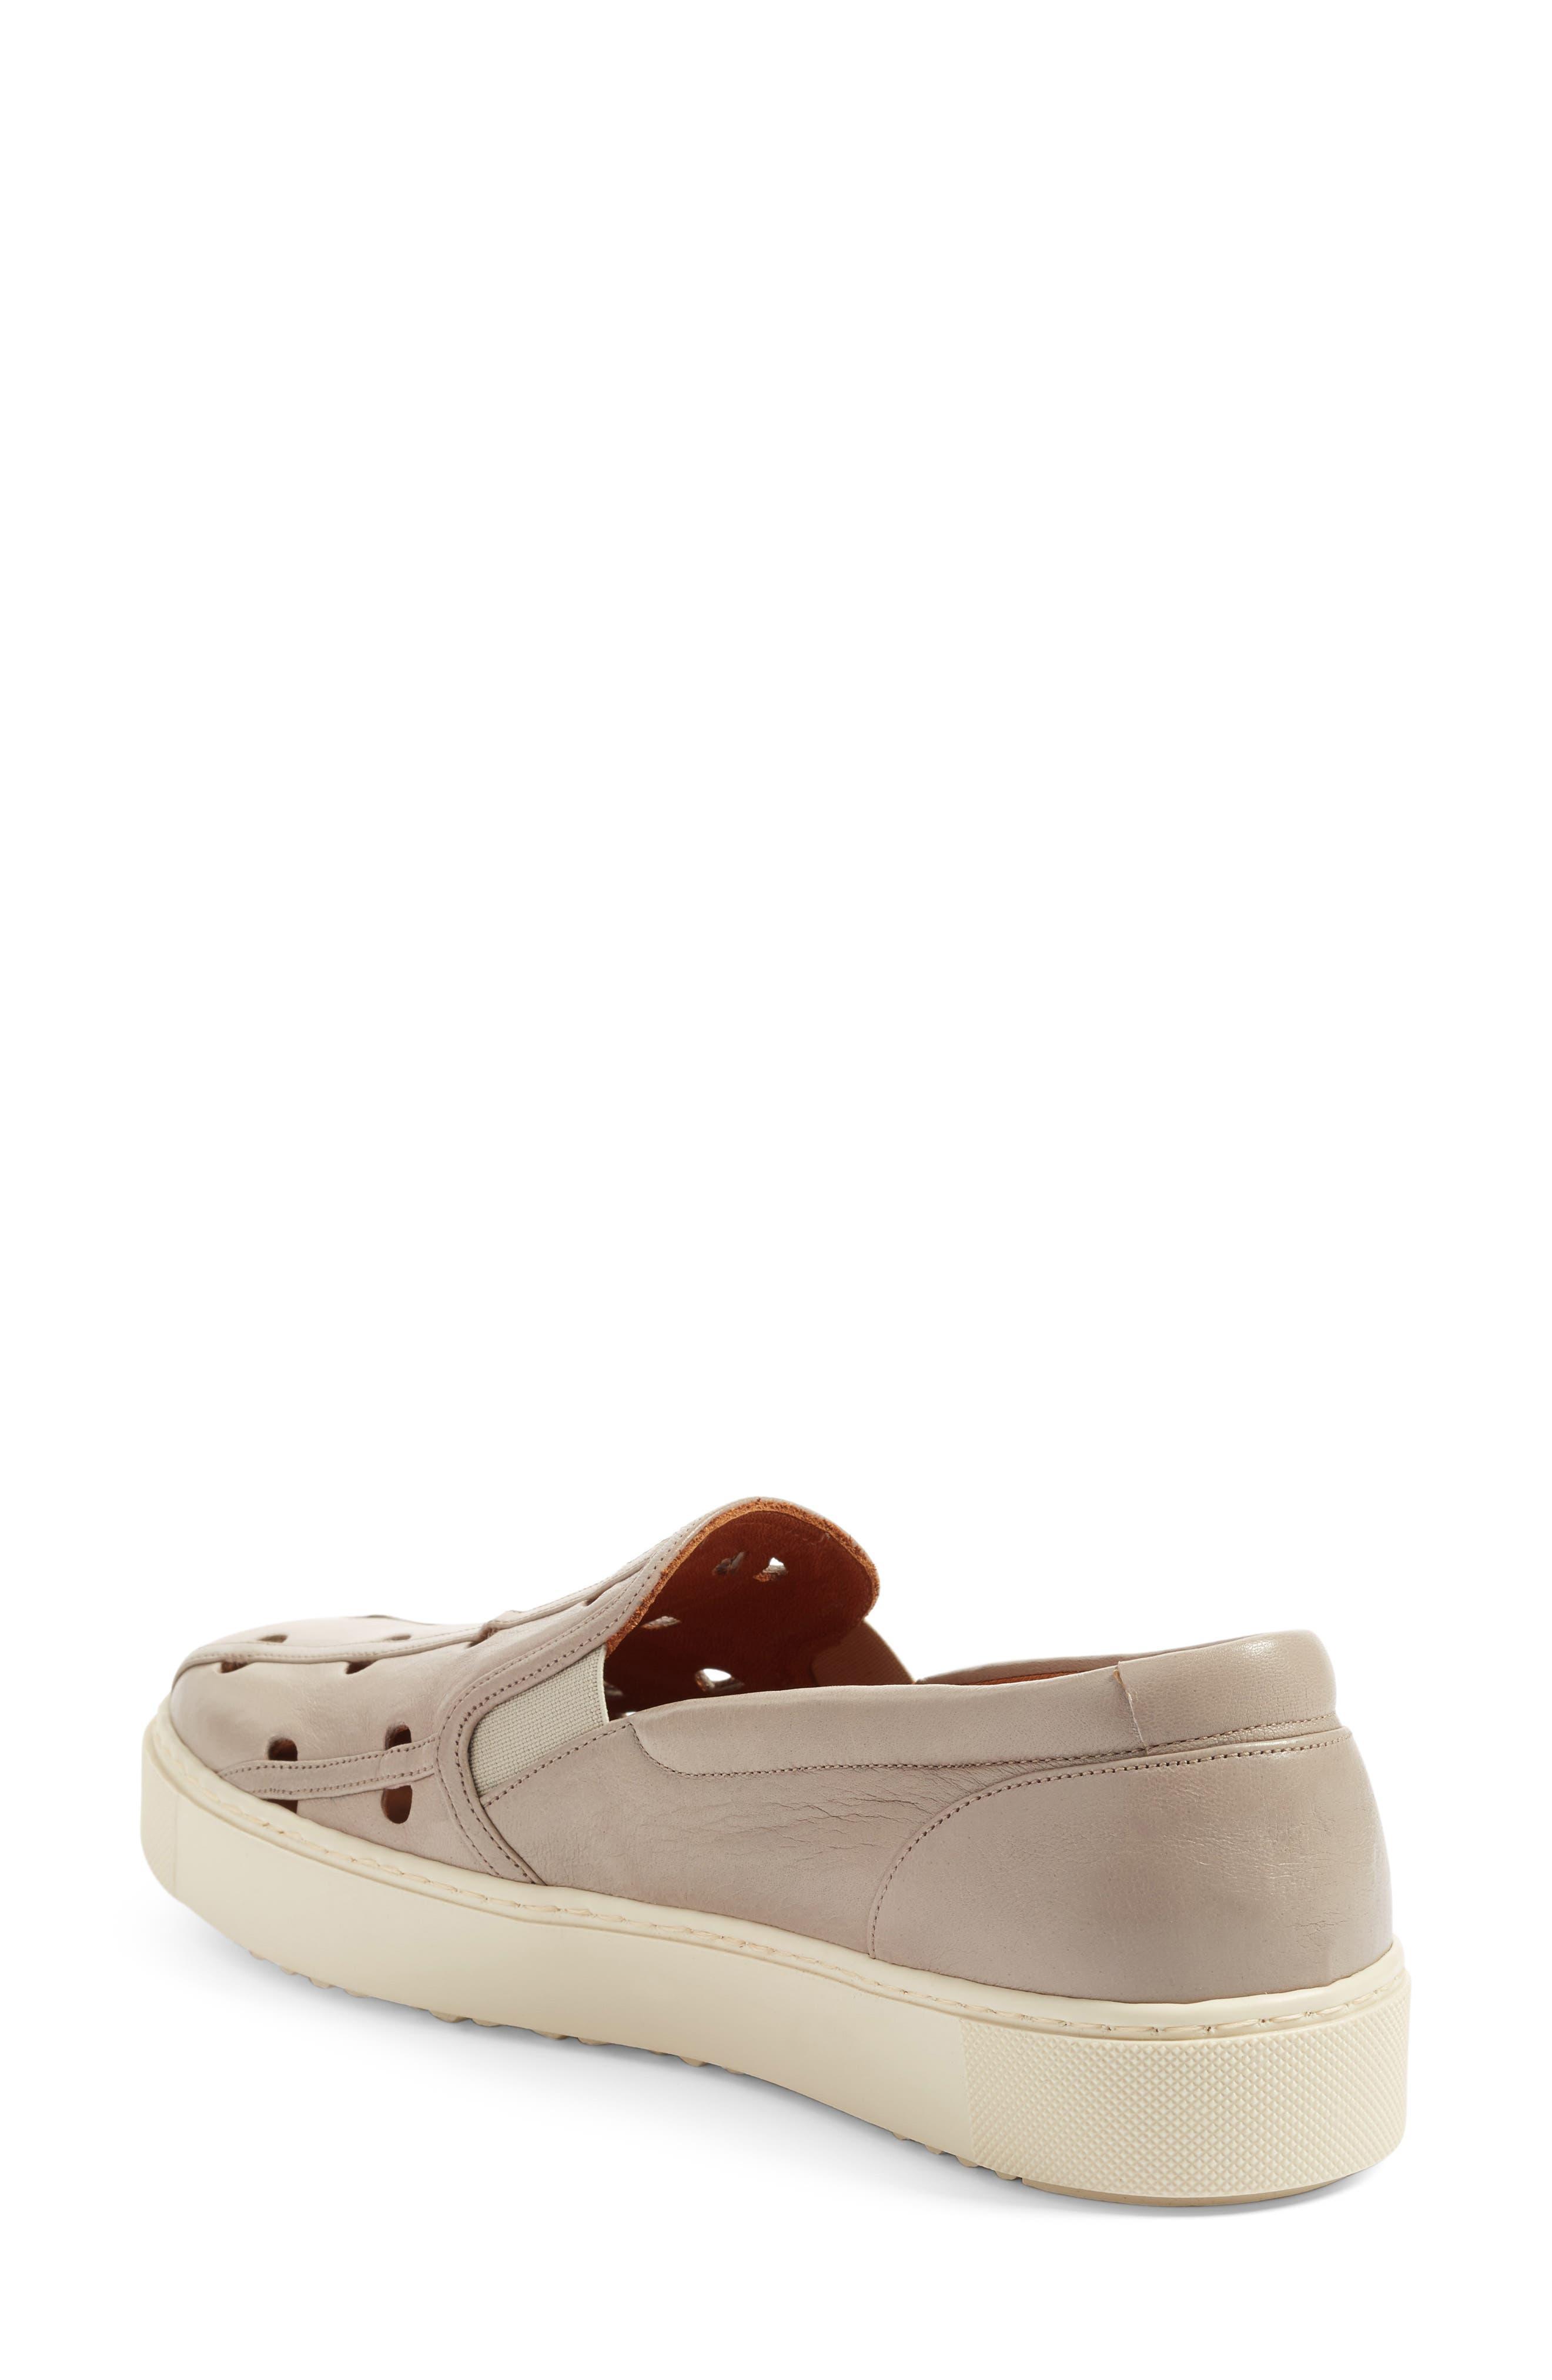 Zanca Slip-On Sneaker,                             Alternate thumbnail 2, color,                             020